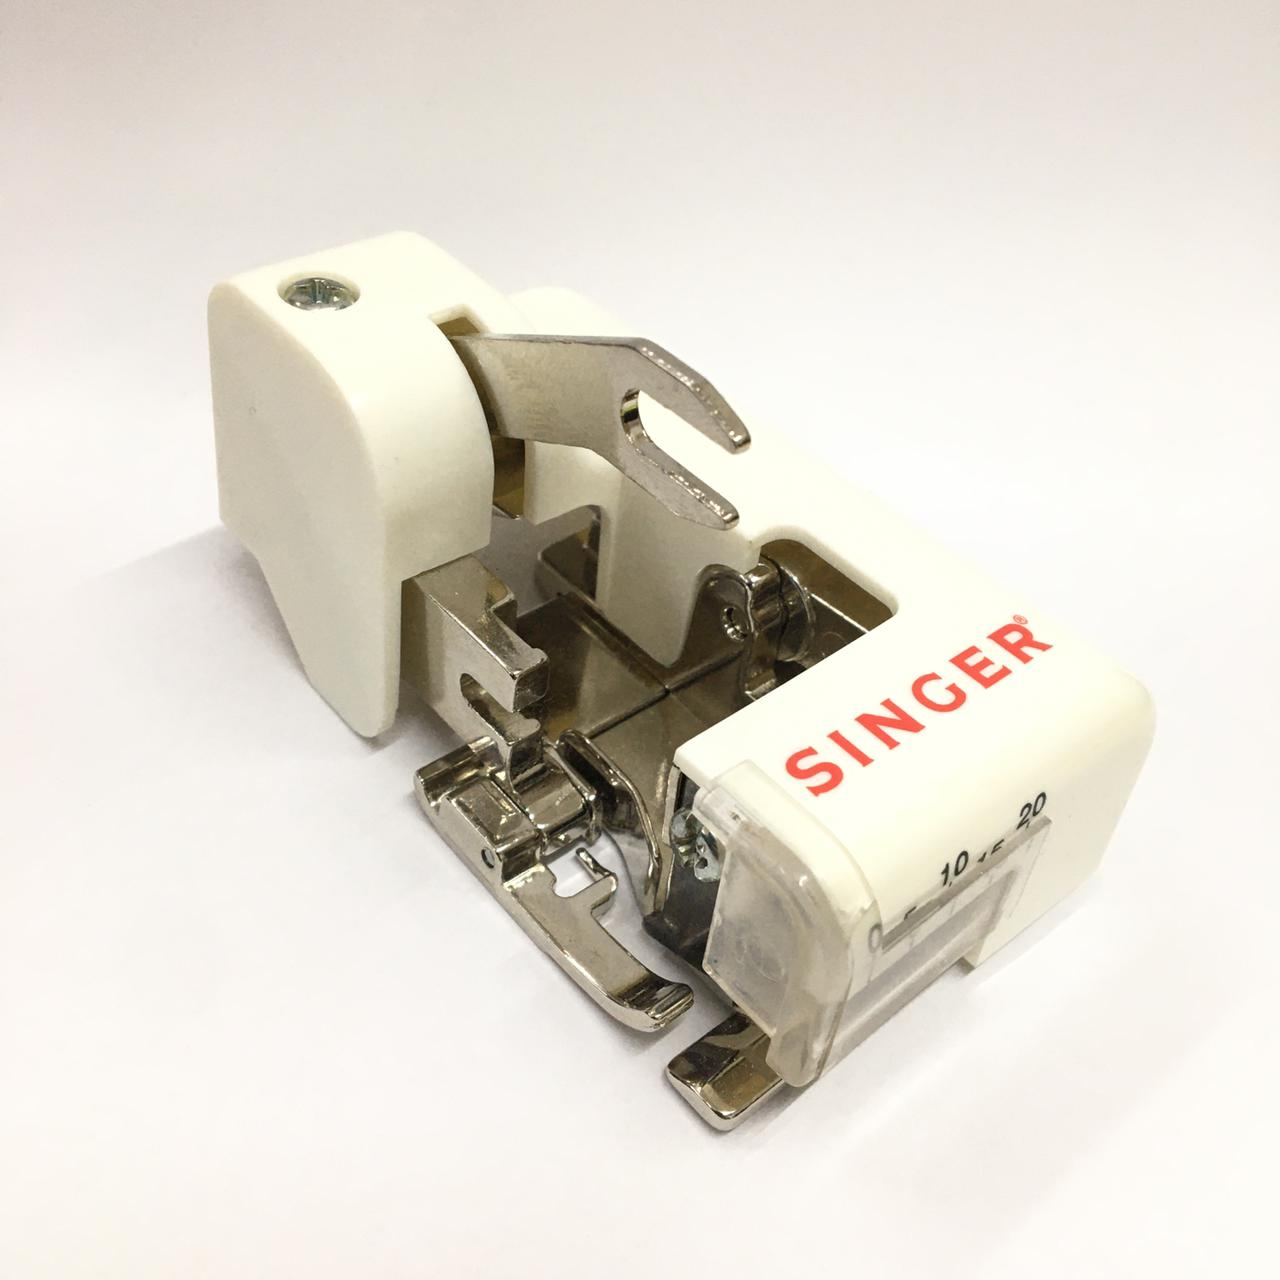 Calcador para Overlock com Faca Domestica - Maquina Domestica